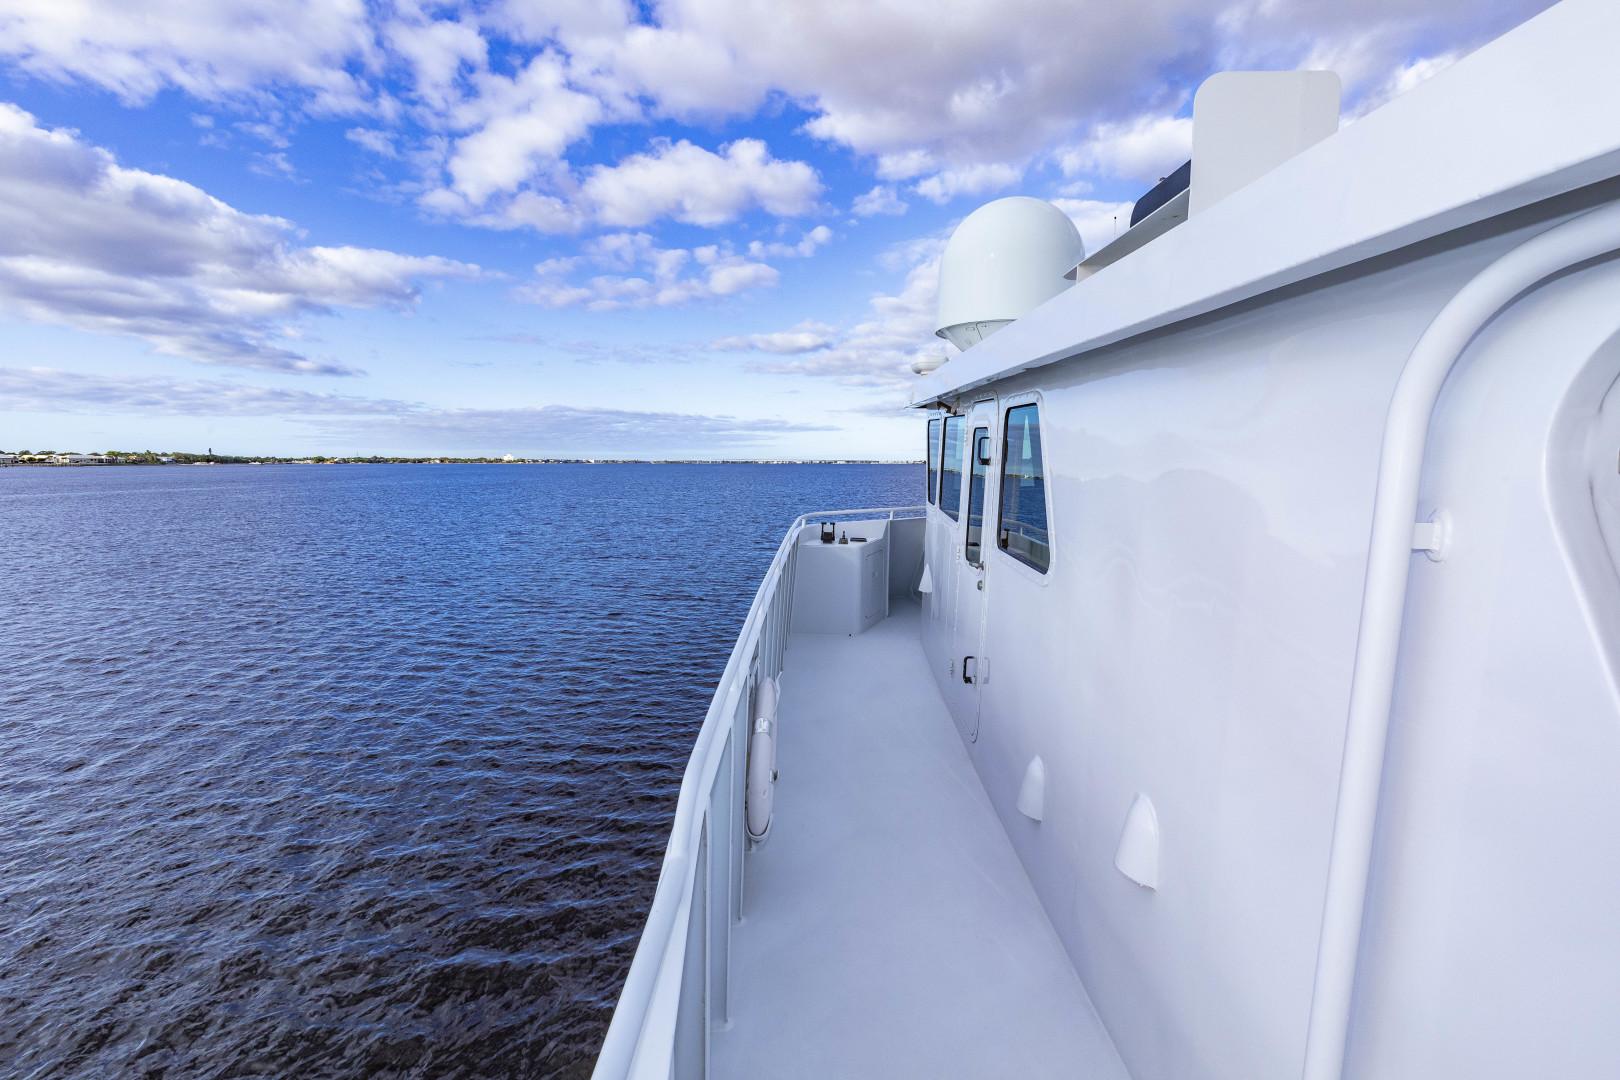 GlassTech-Expedition Yacht 2018-Reset Stuart-Florida-United States-Sidedeck-1568551 | Thumbnail